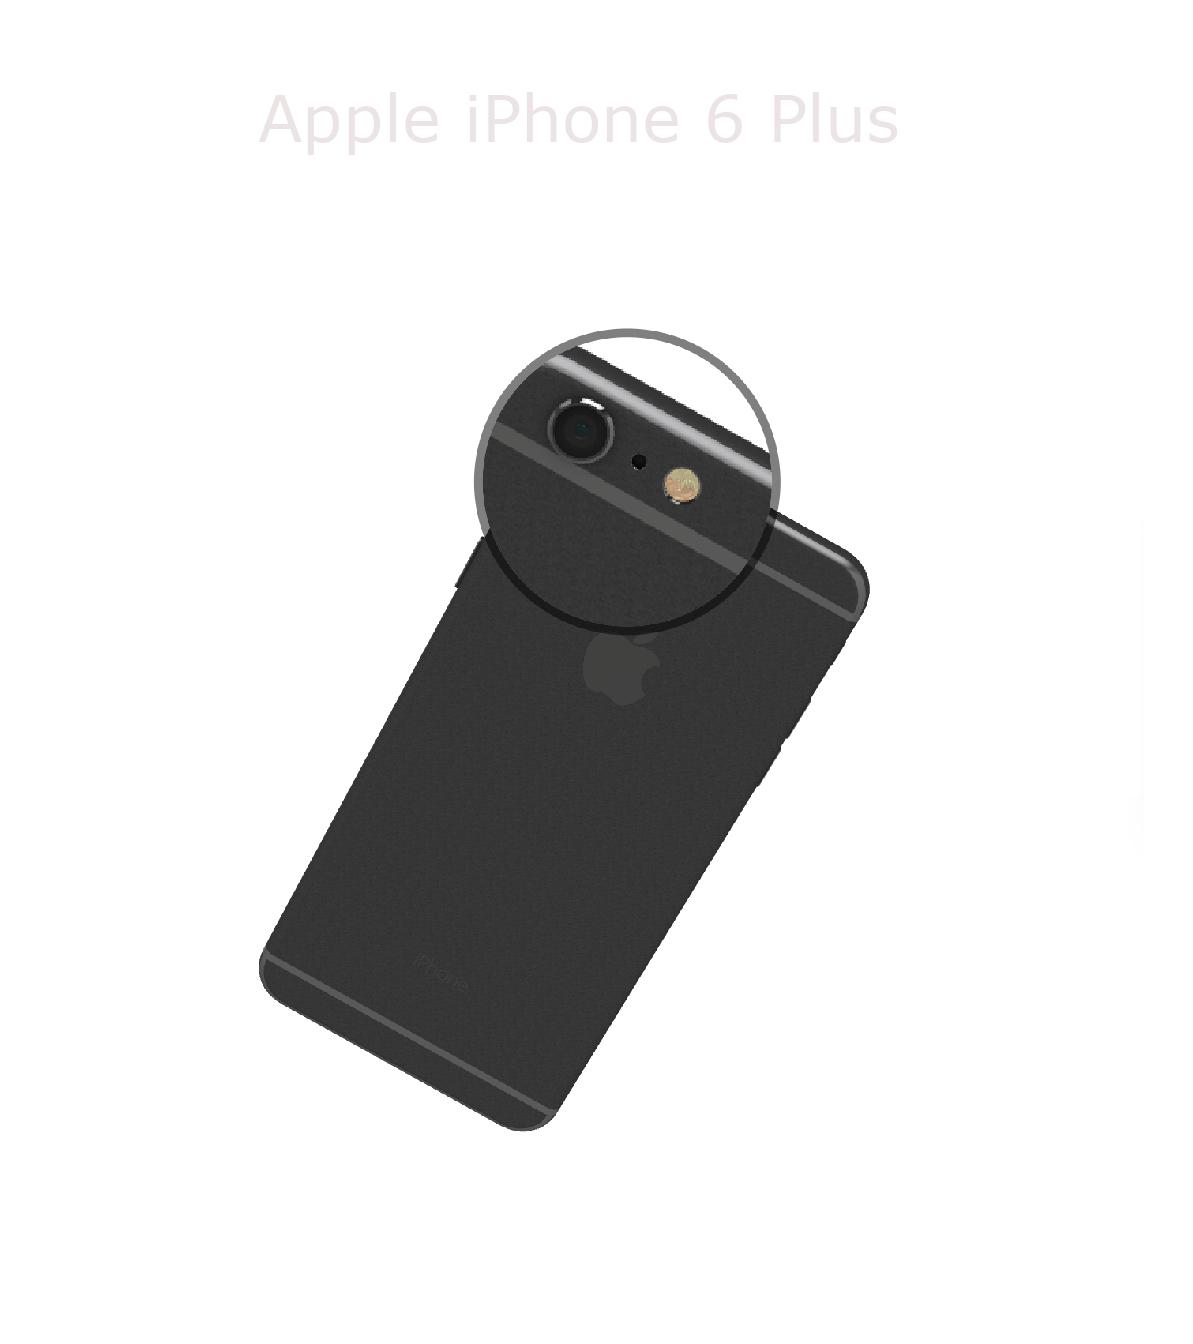 Laga mikrofon kamera iPhone 6 plus